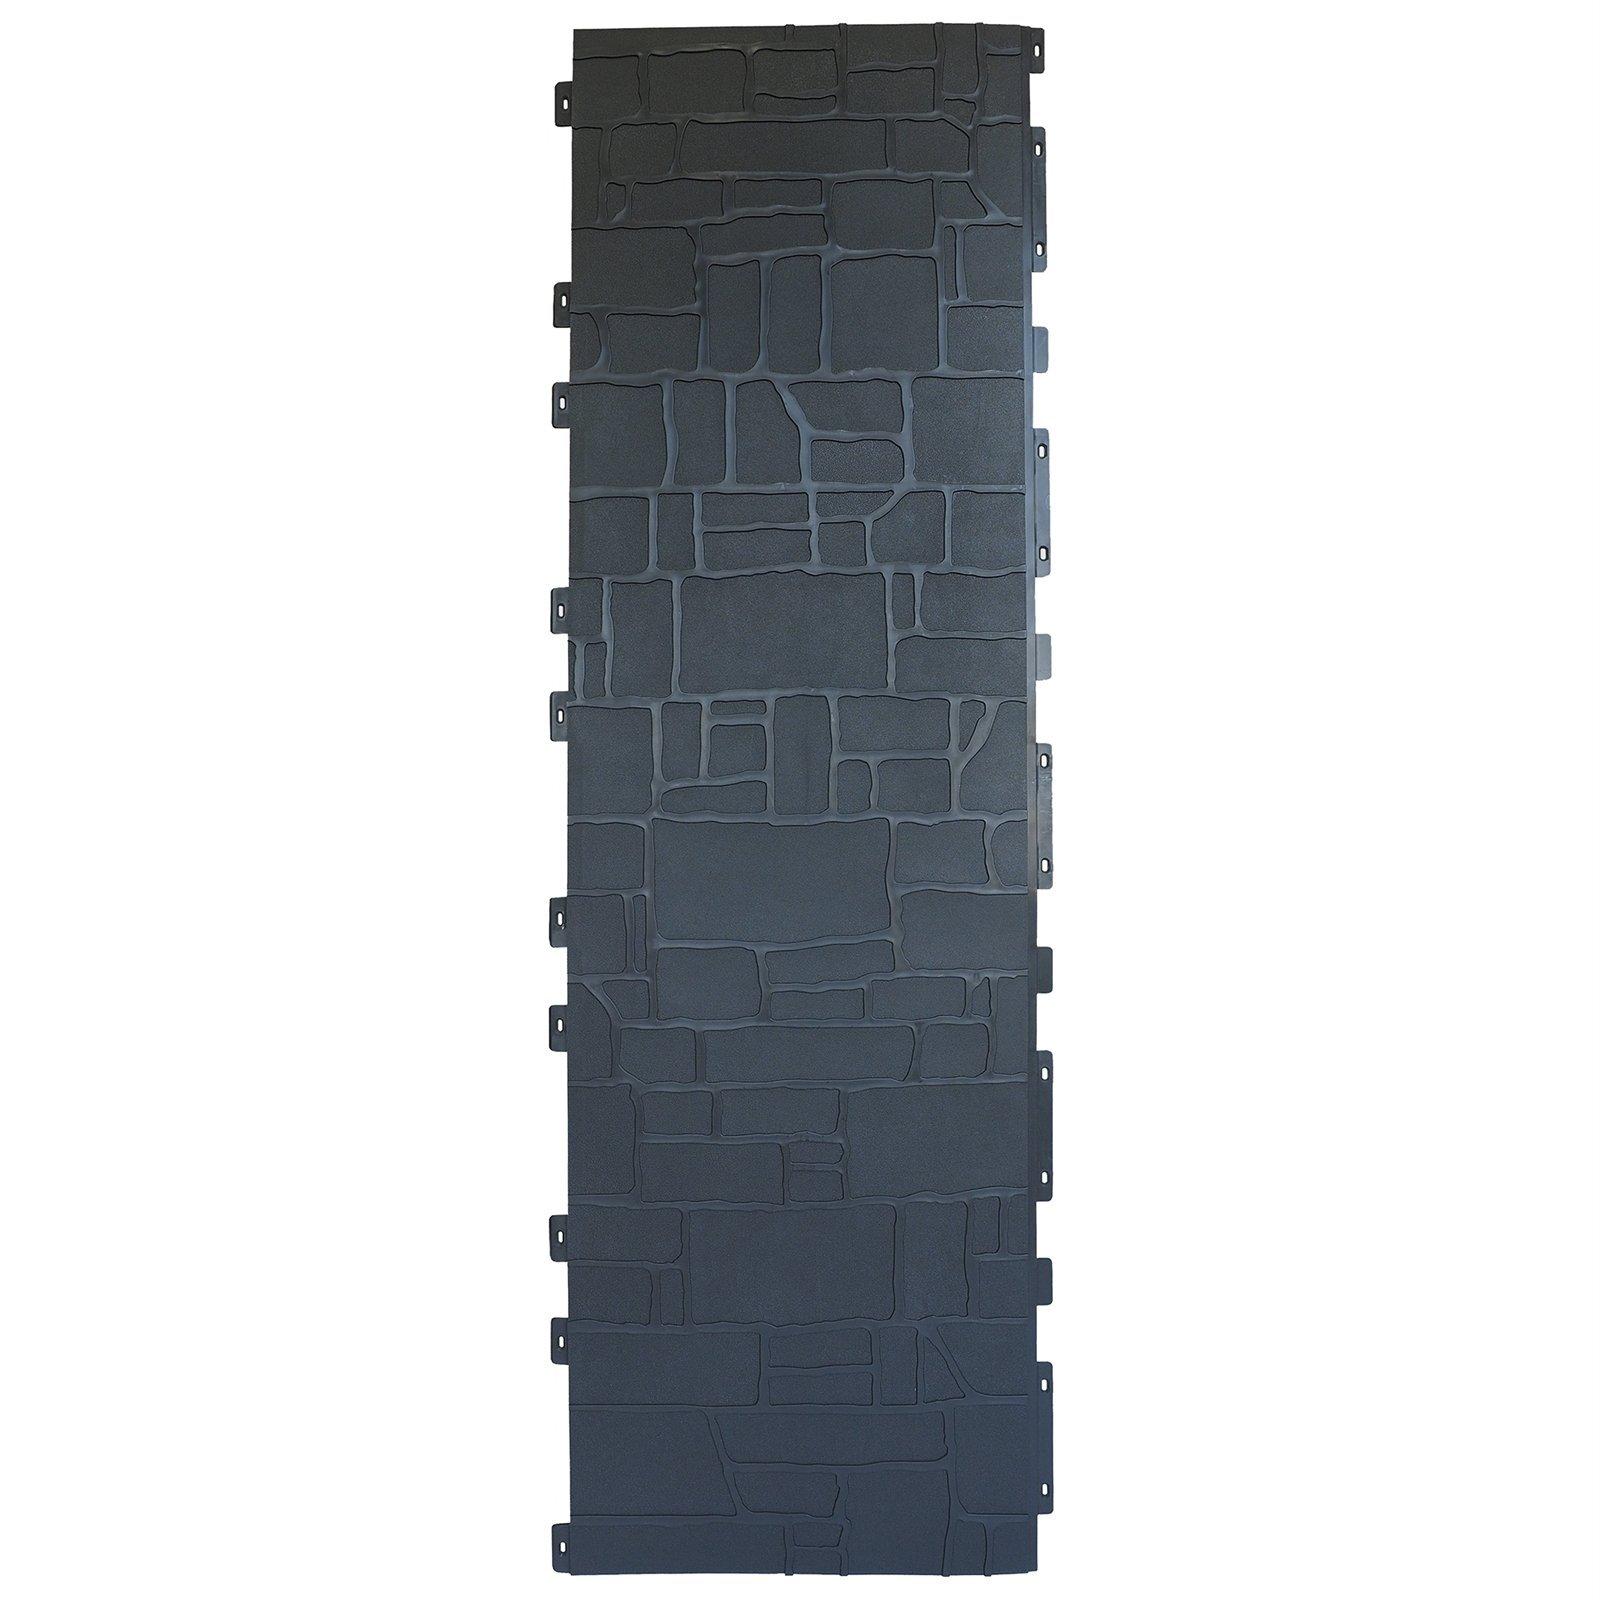 Matrix 1820 x 535mm Slate Grey Drystone Fence Panel